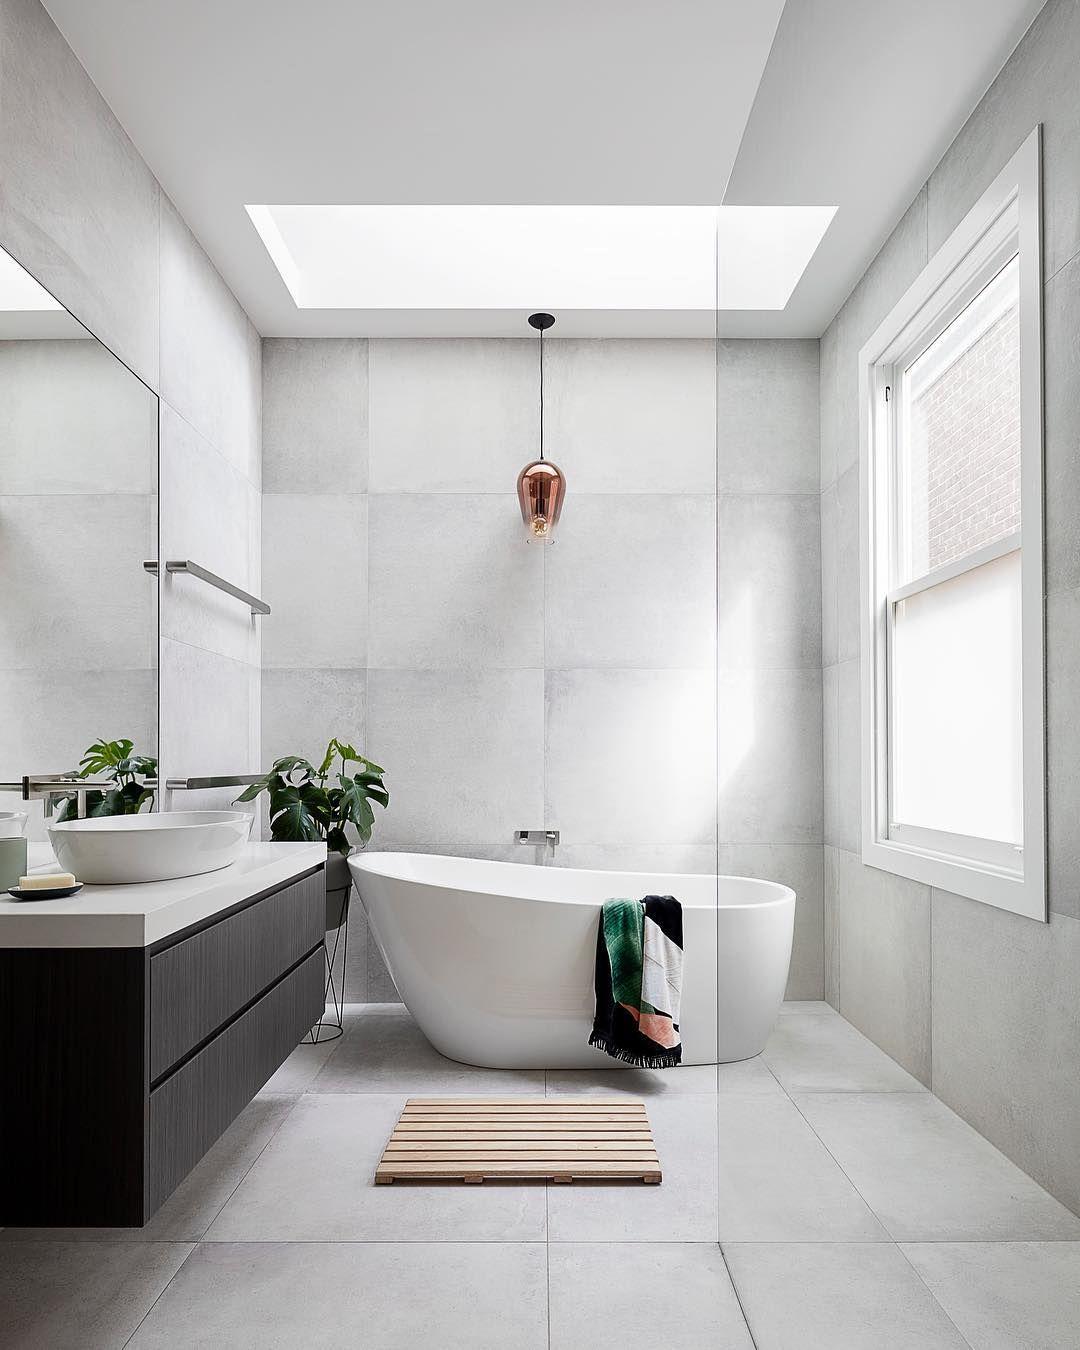 Powerhouse By Glow Building Design Williamstown Vic Www Glowbuildingdesign Com Or Glowbuild Modern Bathroom Bathroom Interior Design Modern Bathroom Design